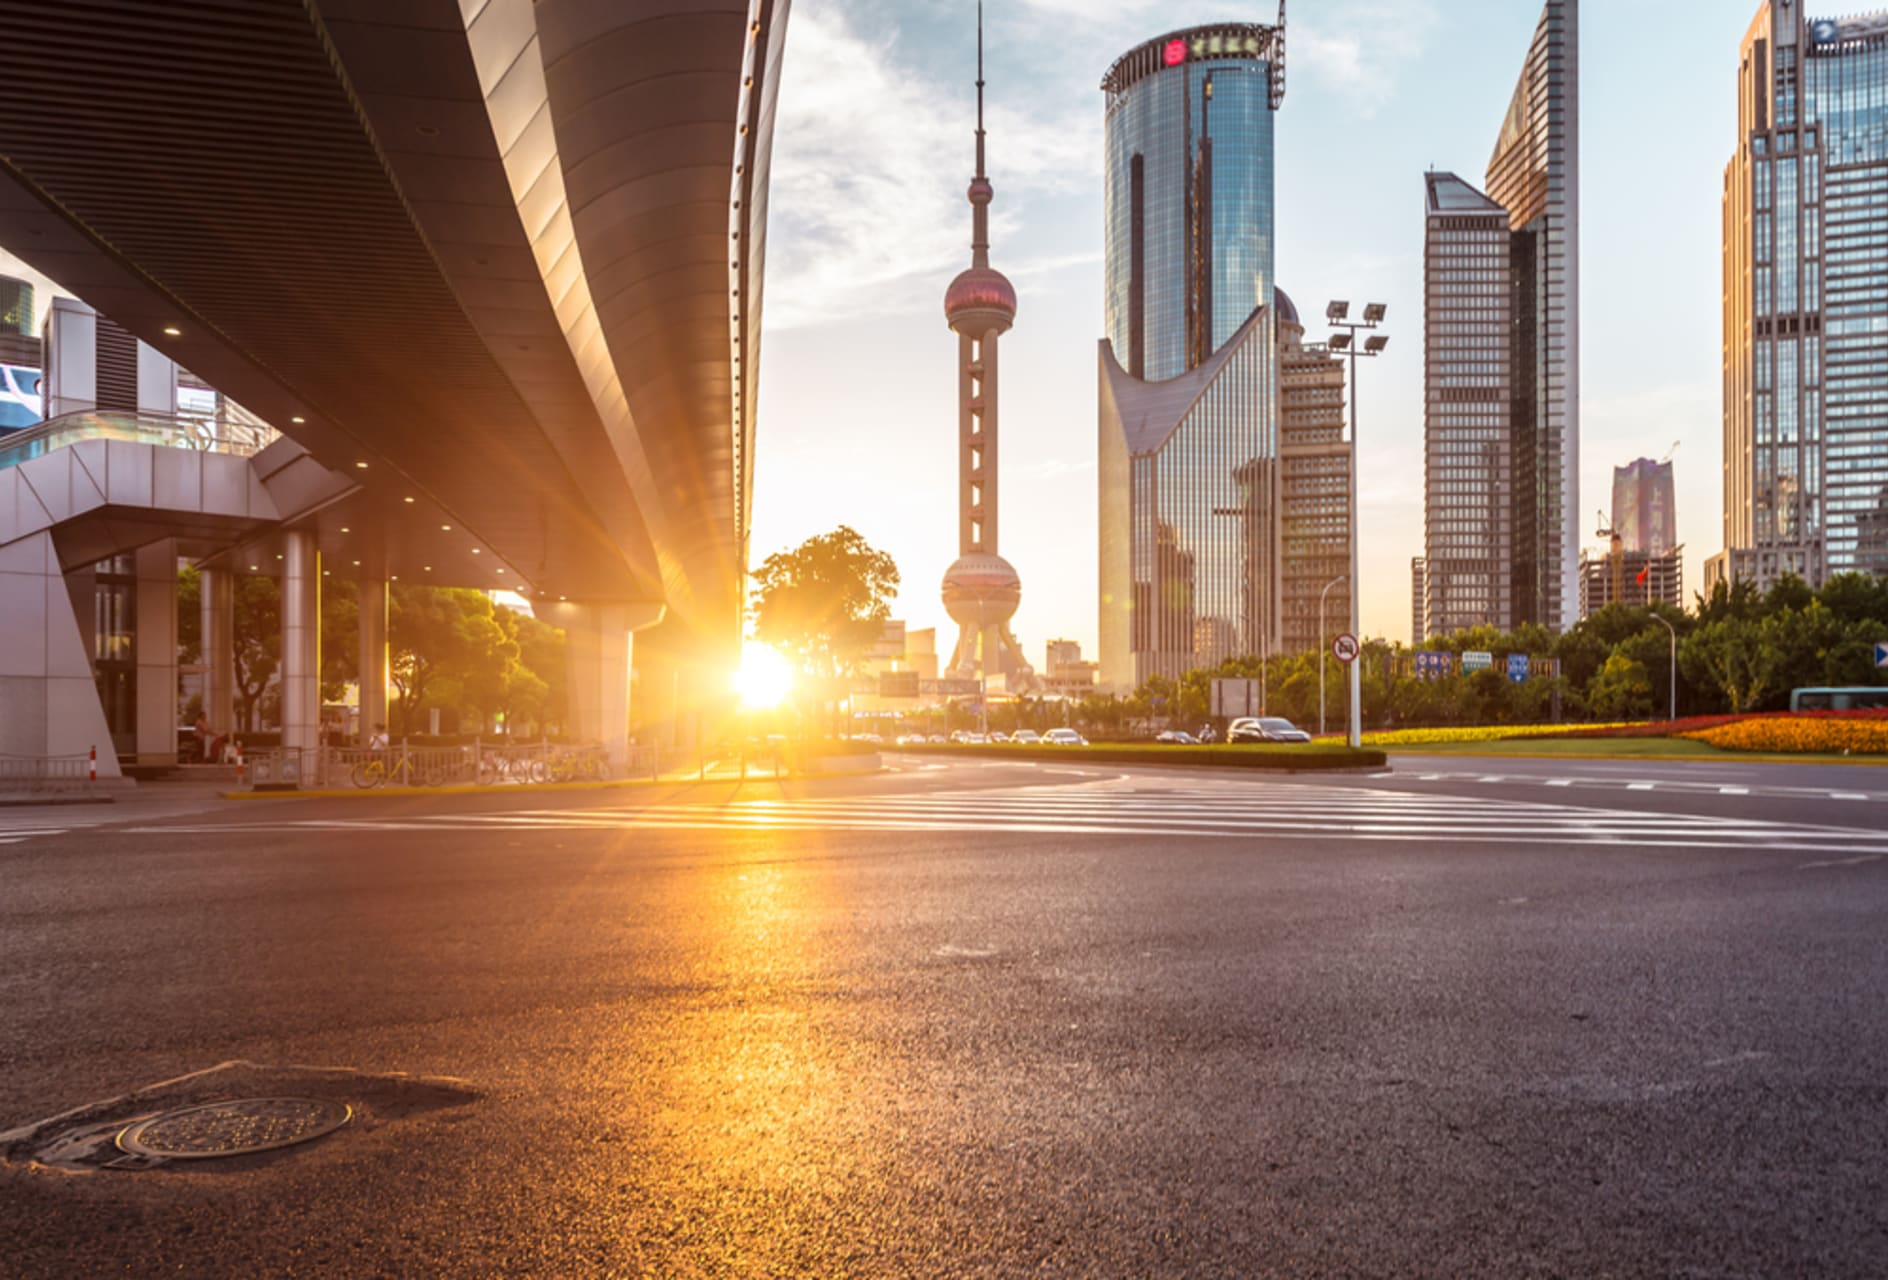 Shanghai - Shanghai's Lujiazui District: Must-see Modern China